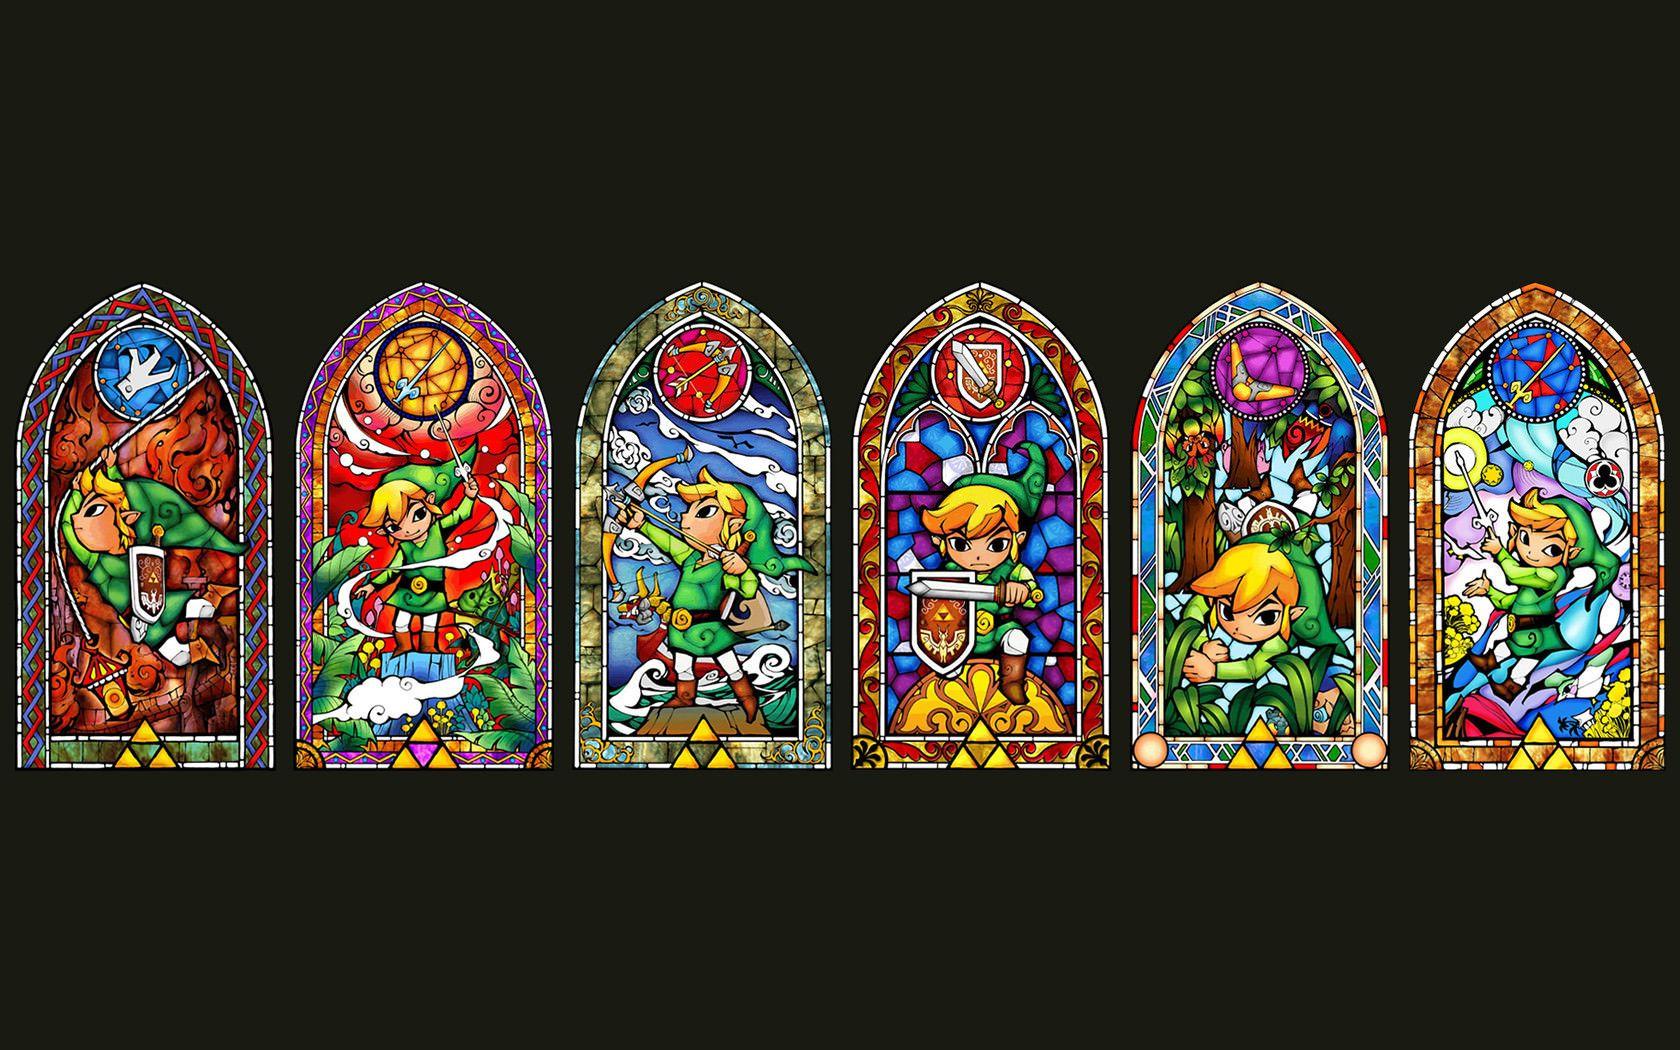 High Definition Mobile Phone And Desktop Wallpapers Legend Of Zelda Zelda Hd Wind Waker